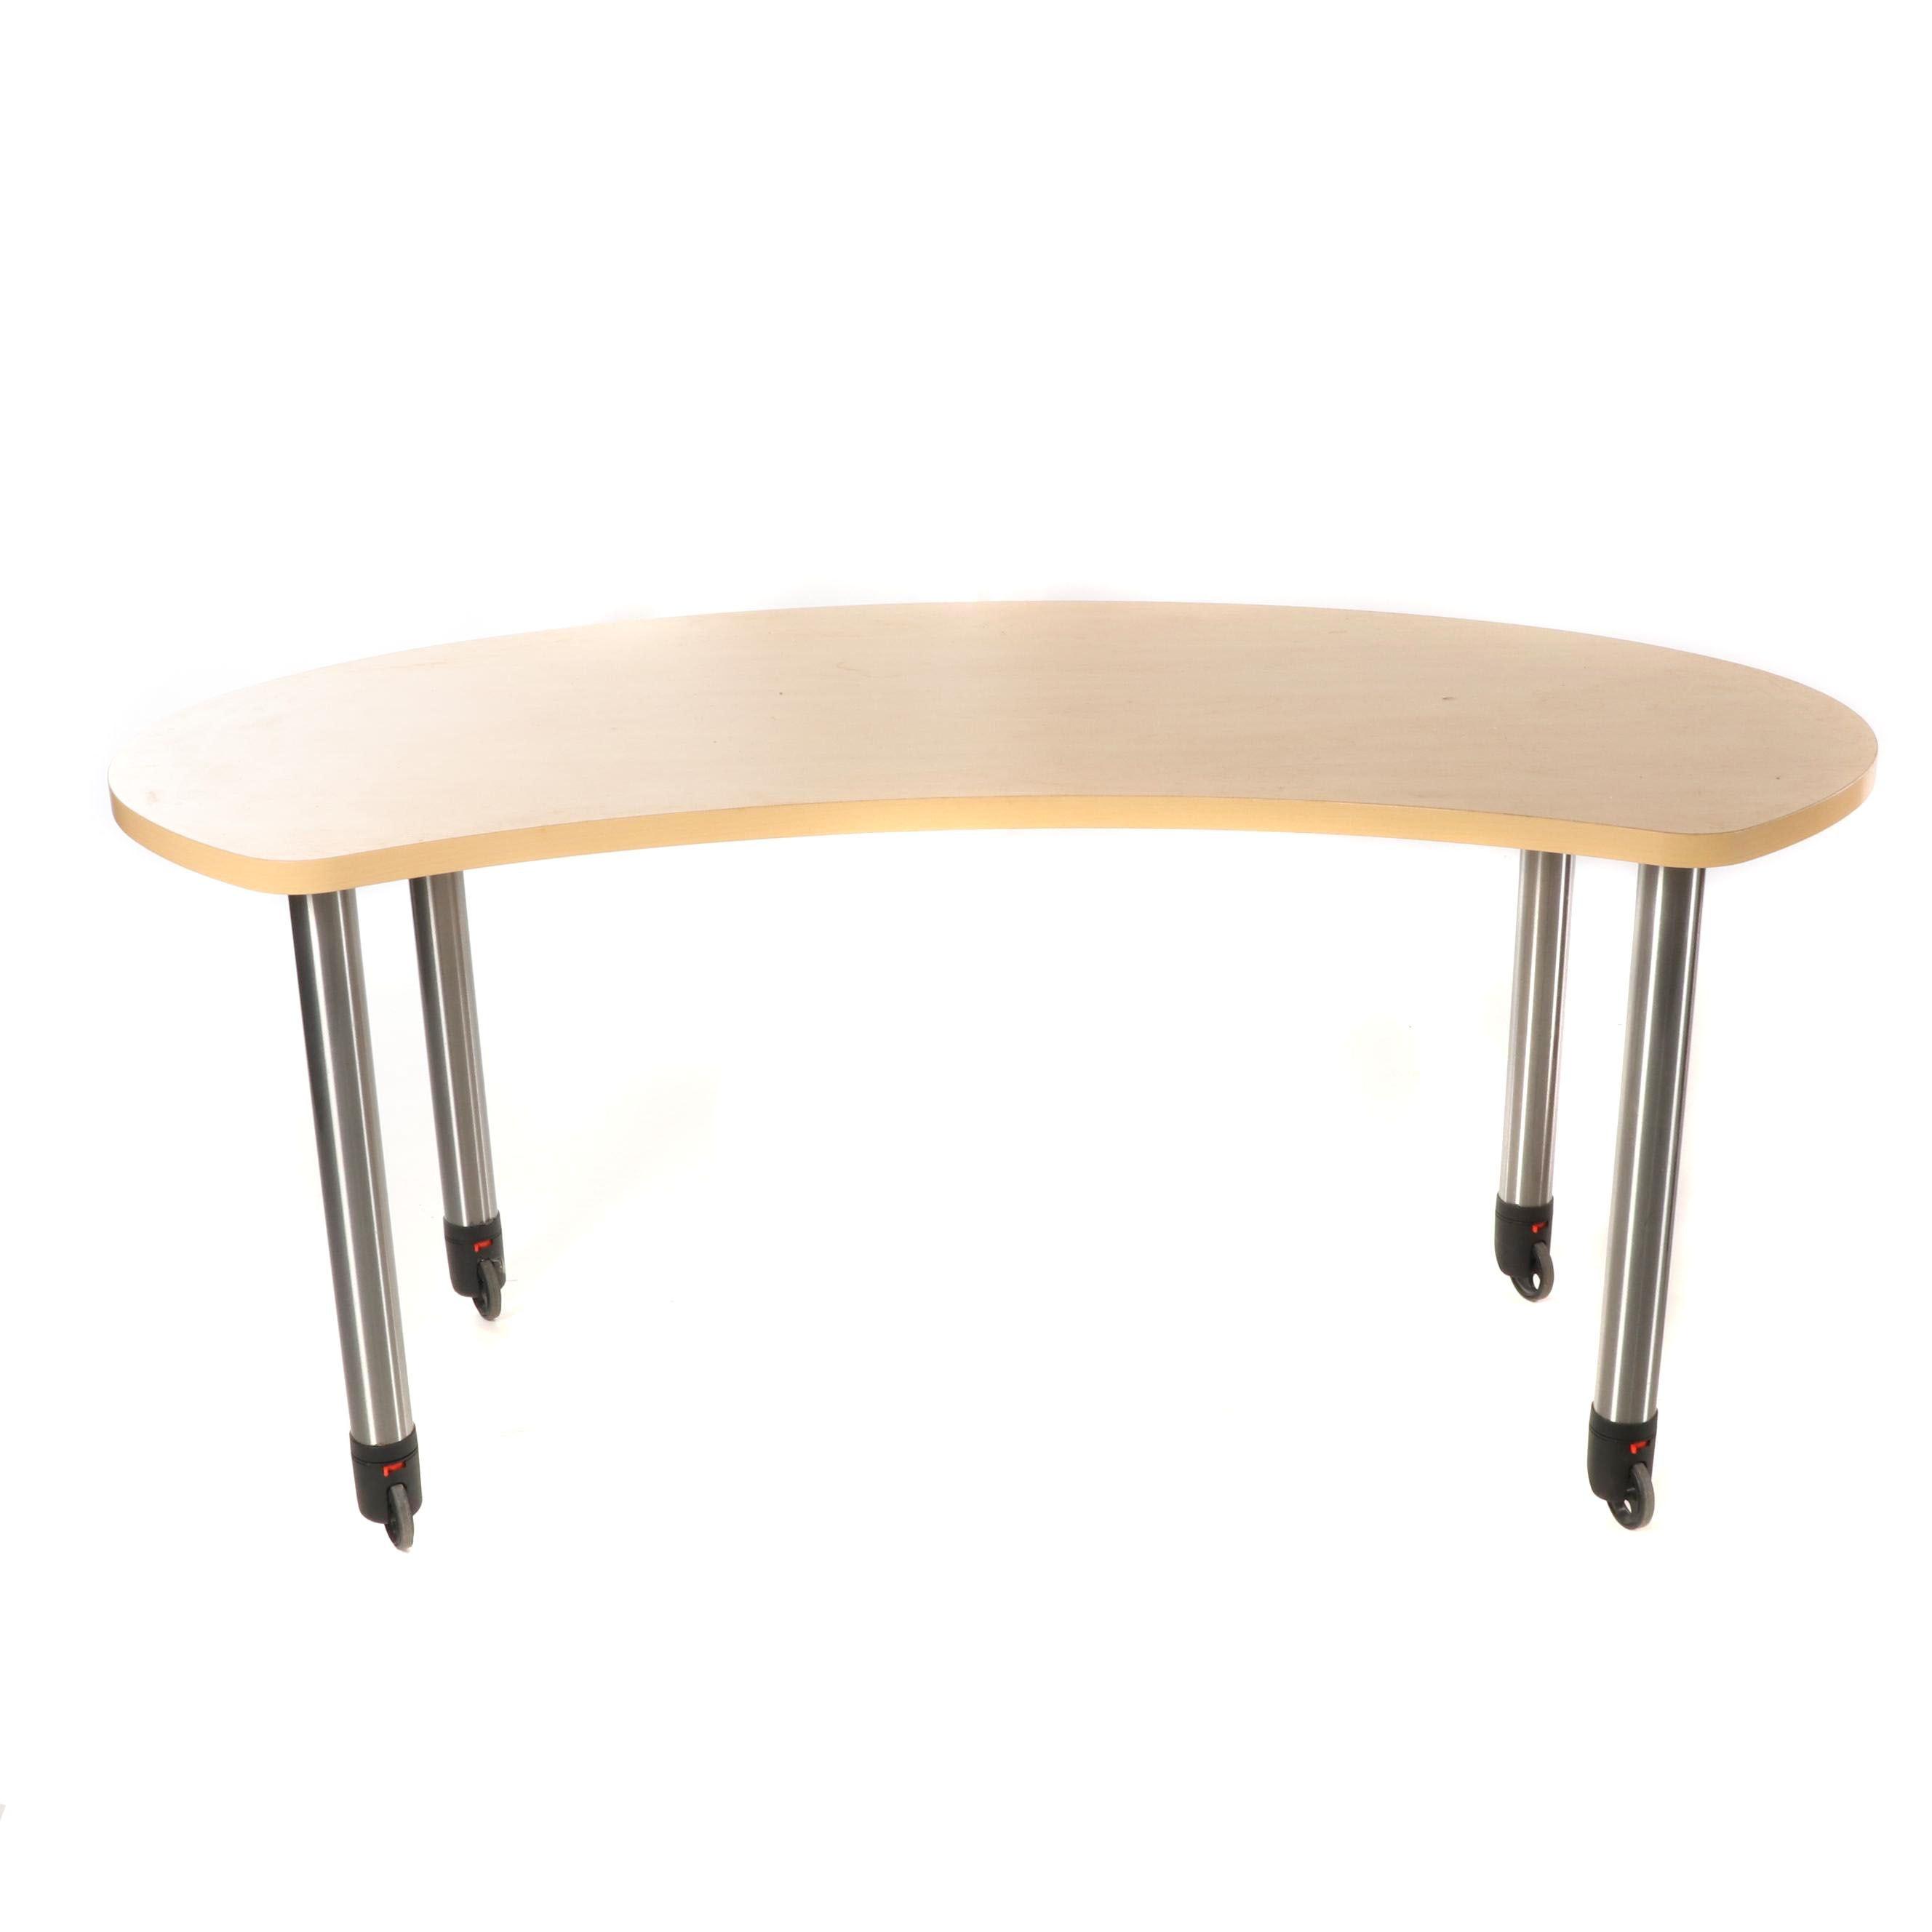 Maple Veneer Curved Work Table on Wheels, 21st Century